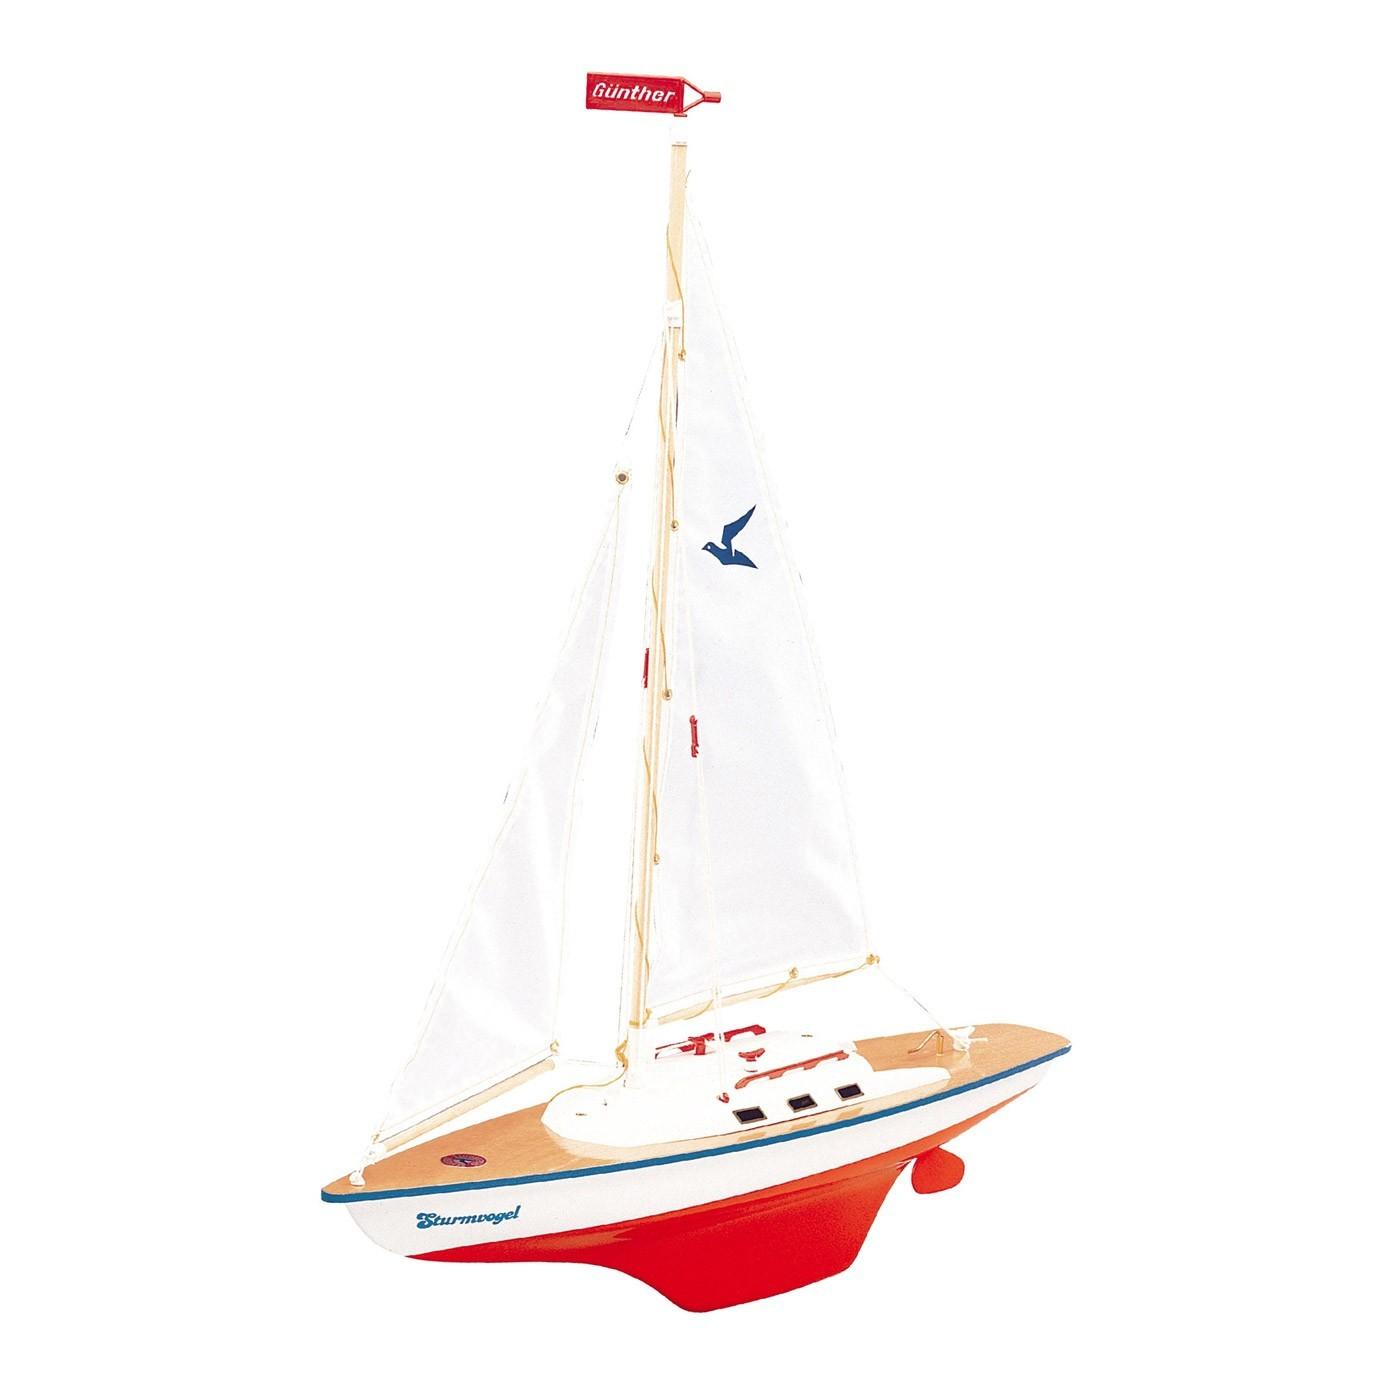 Model plachetnice STURMVOGEL 55x67 cm (dřevo)